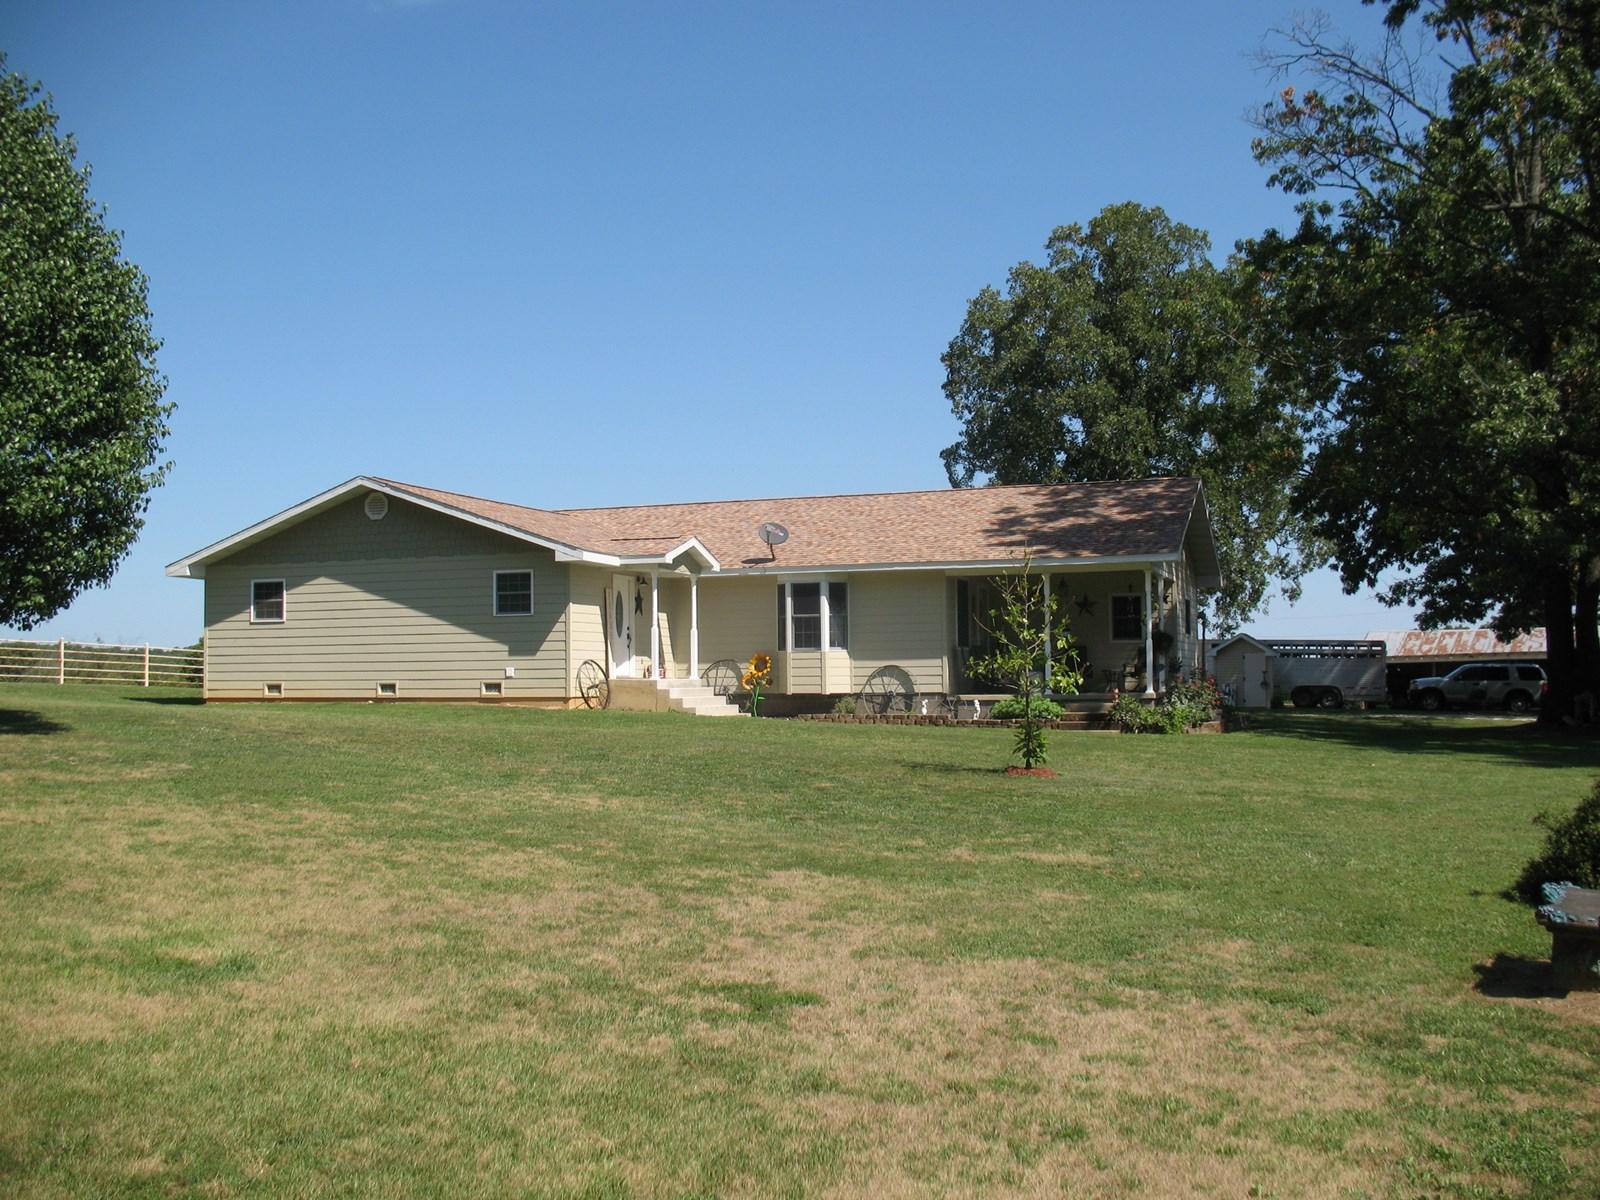 Missouri Ozarks, Livestock, Dairy, Cattle, Ranch, Hay, Farm